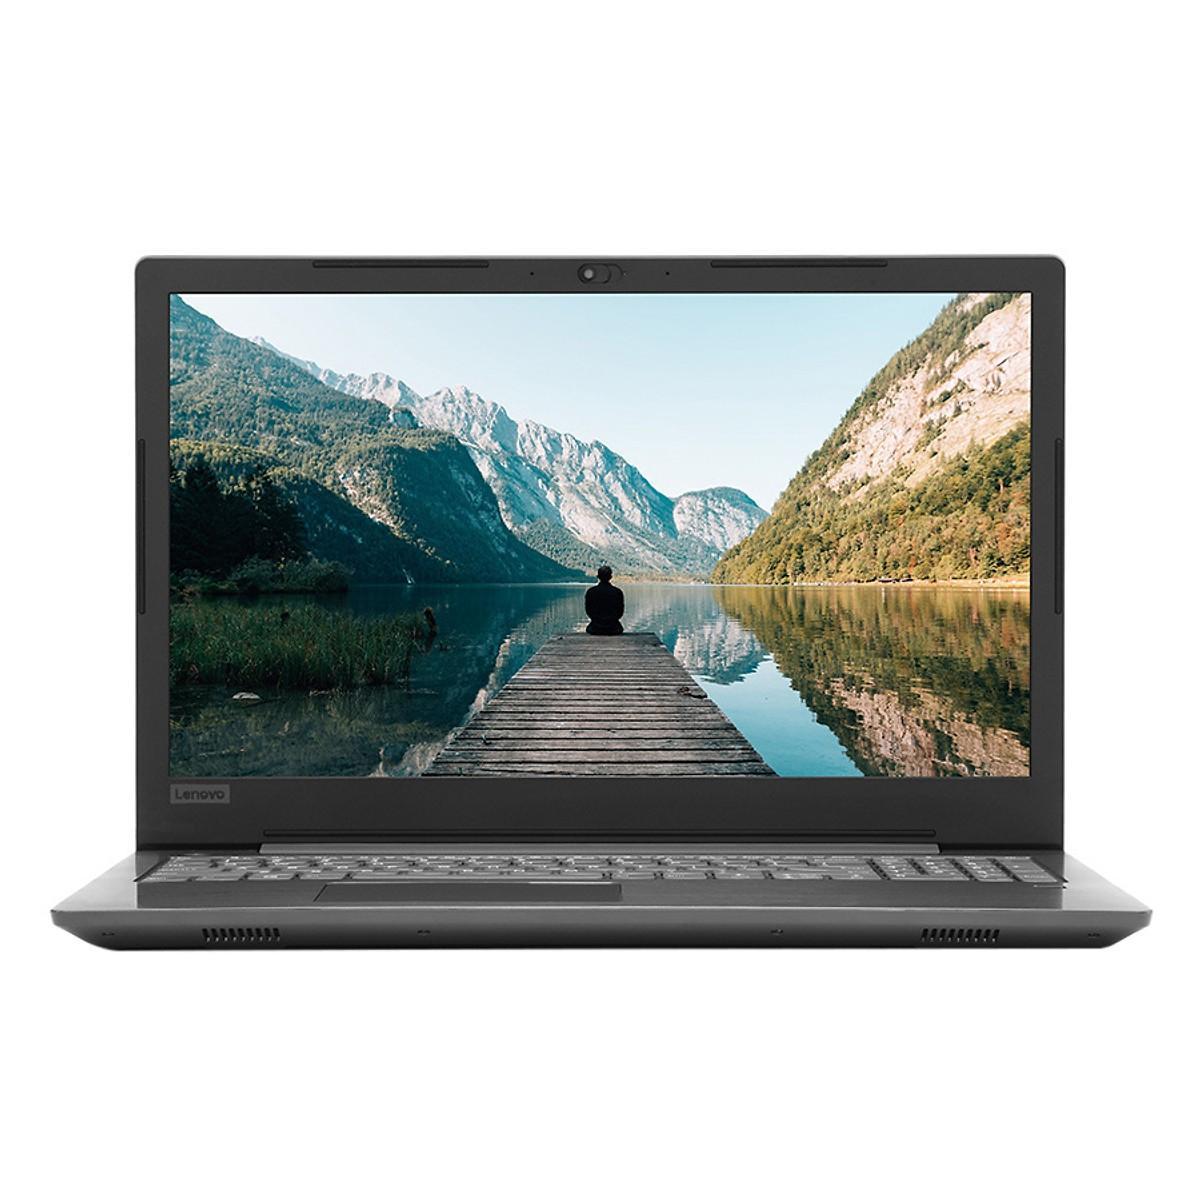 "Laptop Lenovo V330-15IKB 81AX00MCVN Core i5-8250U/Free Dos (15.6"" HD)"